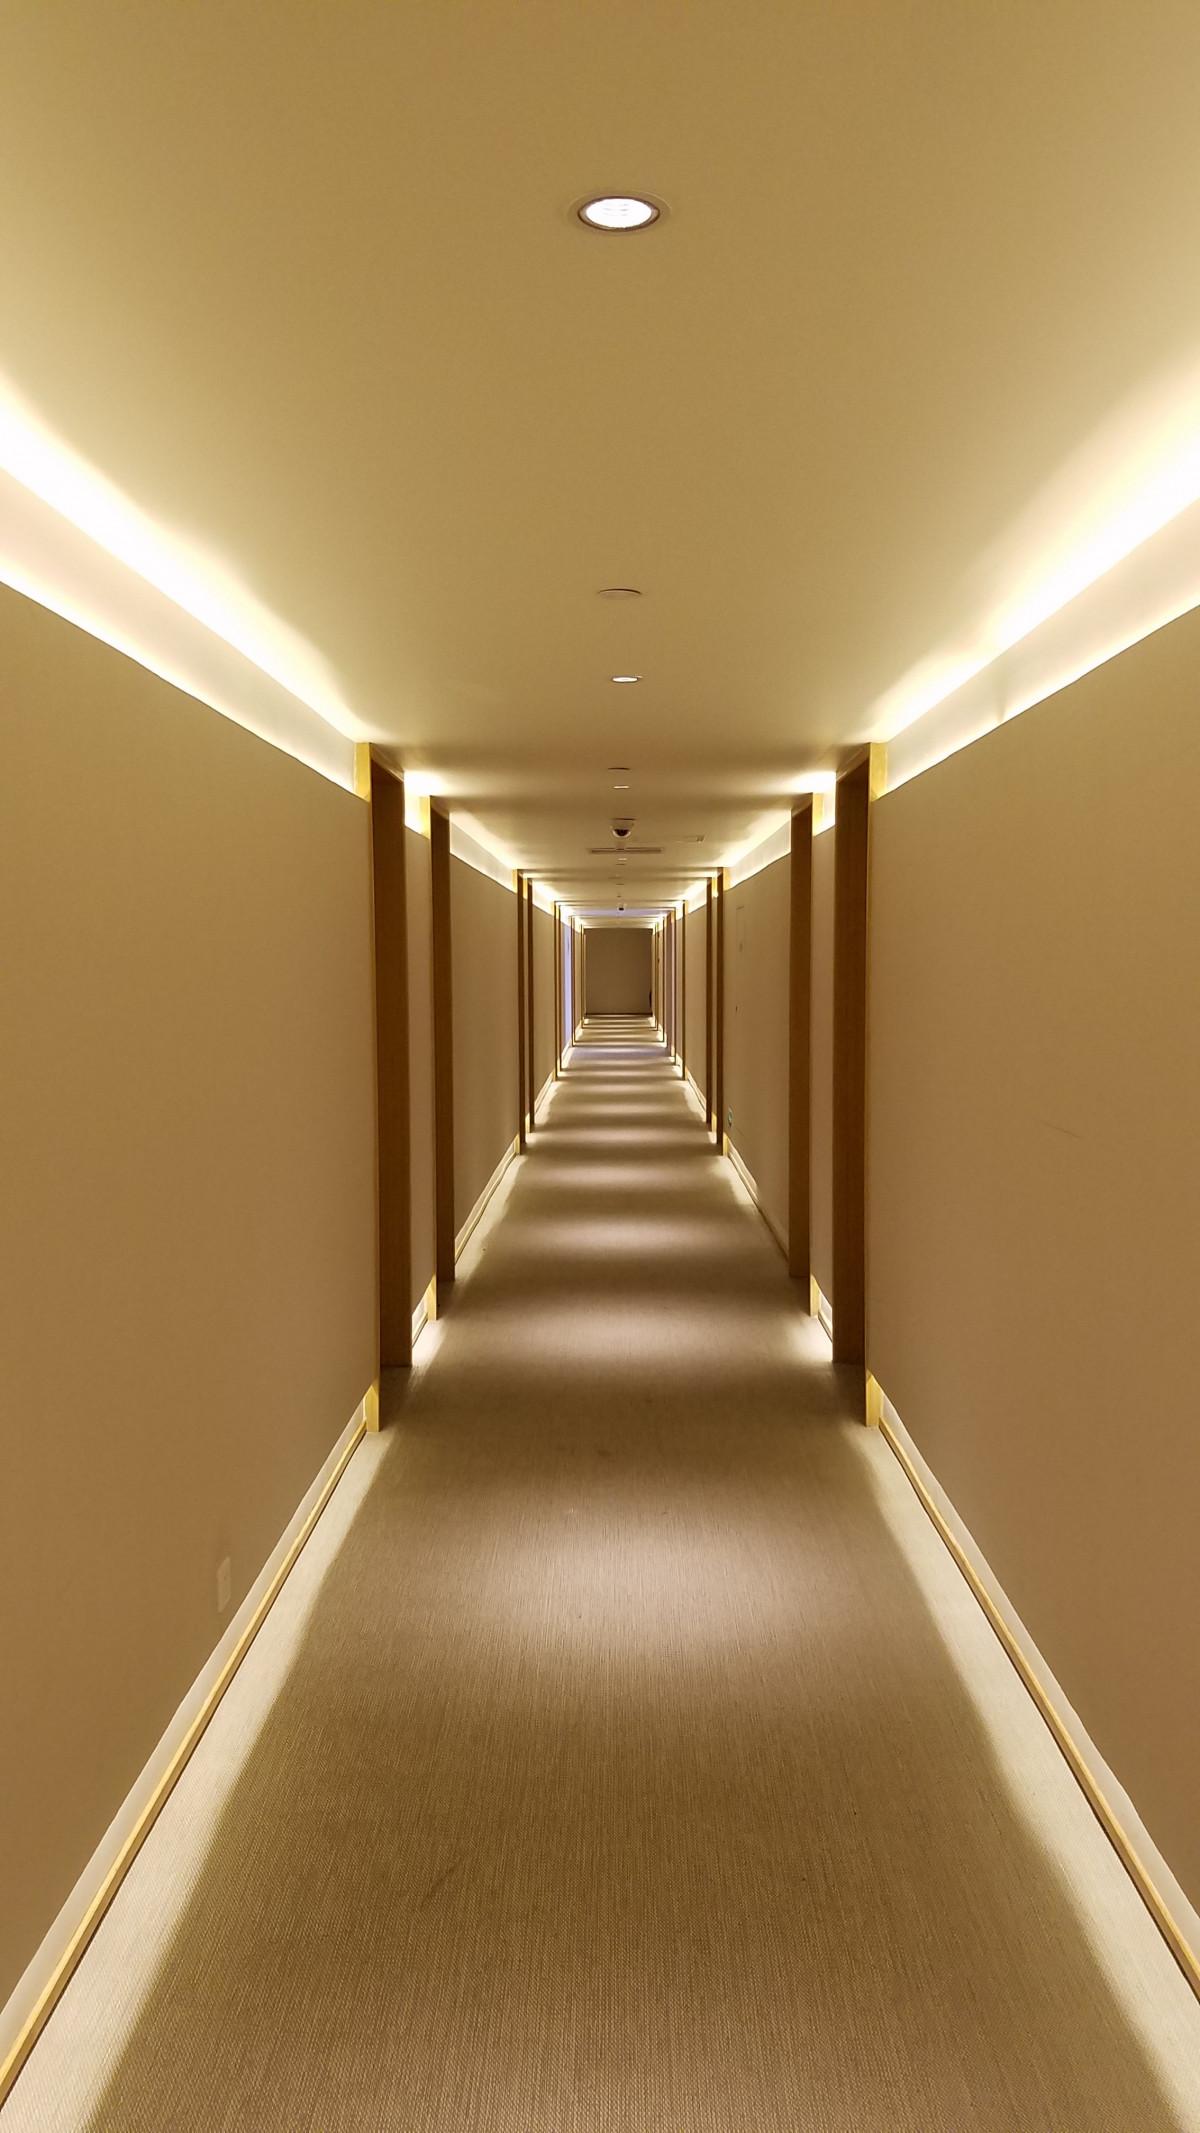 Free images floor ceiling hall empty room lighting for Hotel corridor decor